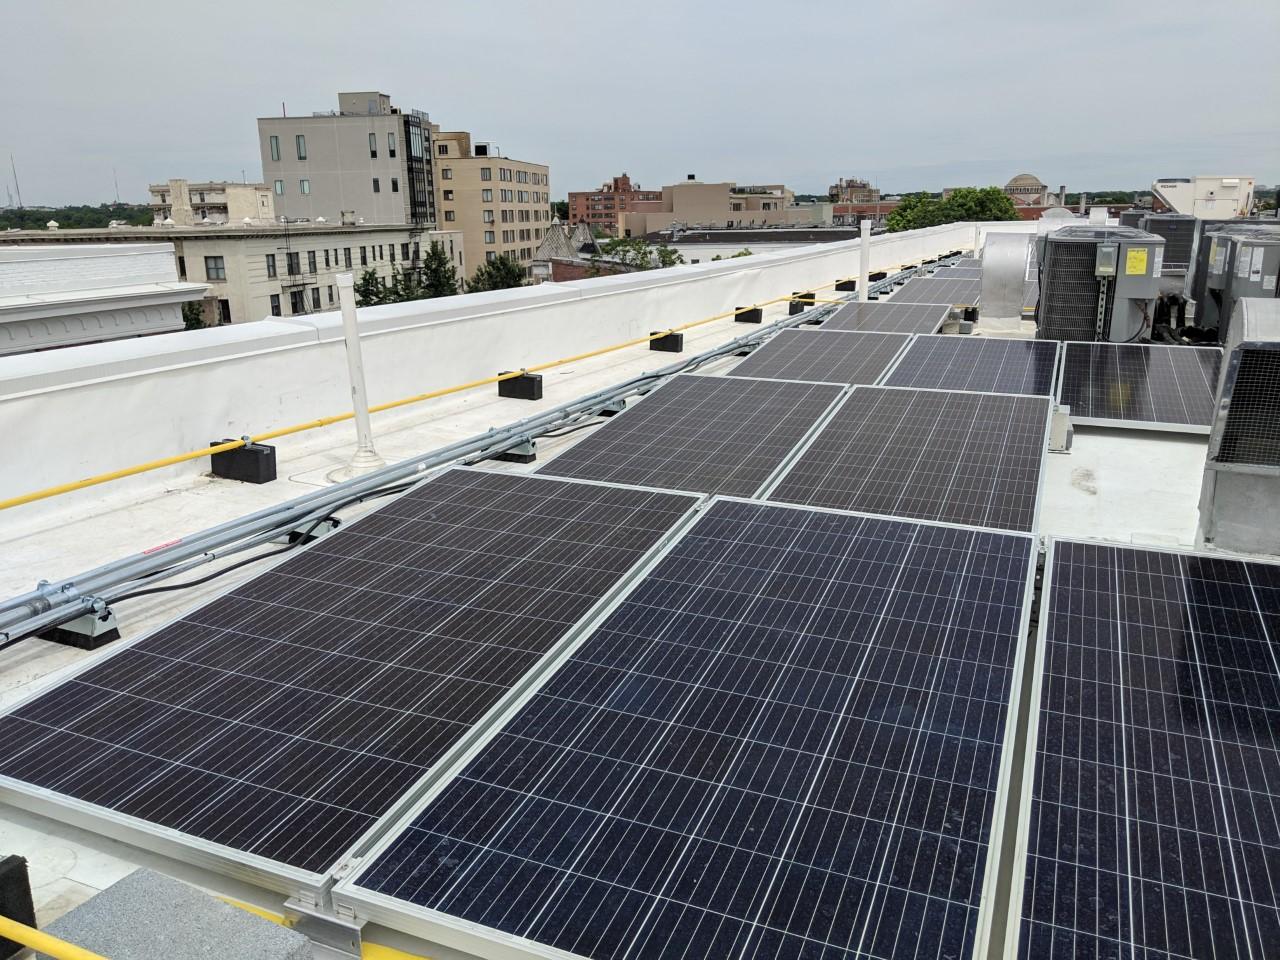 Solar array of Maycroft Apartments. Photo Credit: New Partners Community Solar